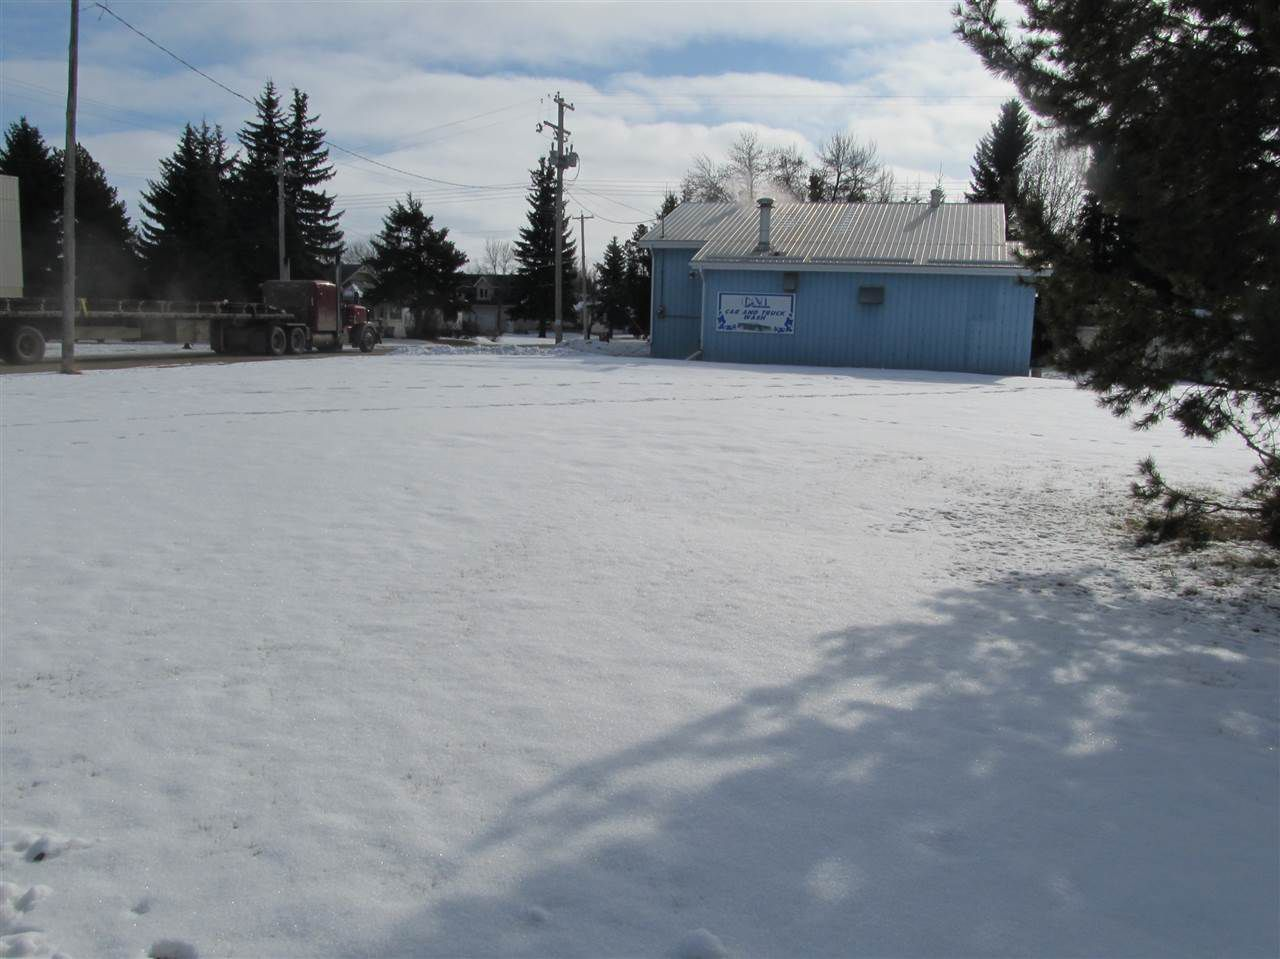 Main Photo: 5003 50 Avenue: Legal Land Commercial for sale : MLS®# E4052436